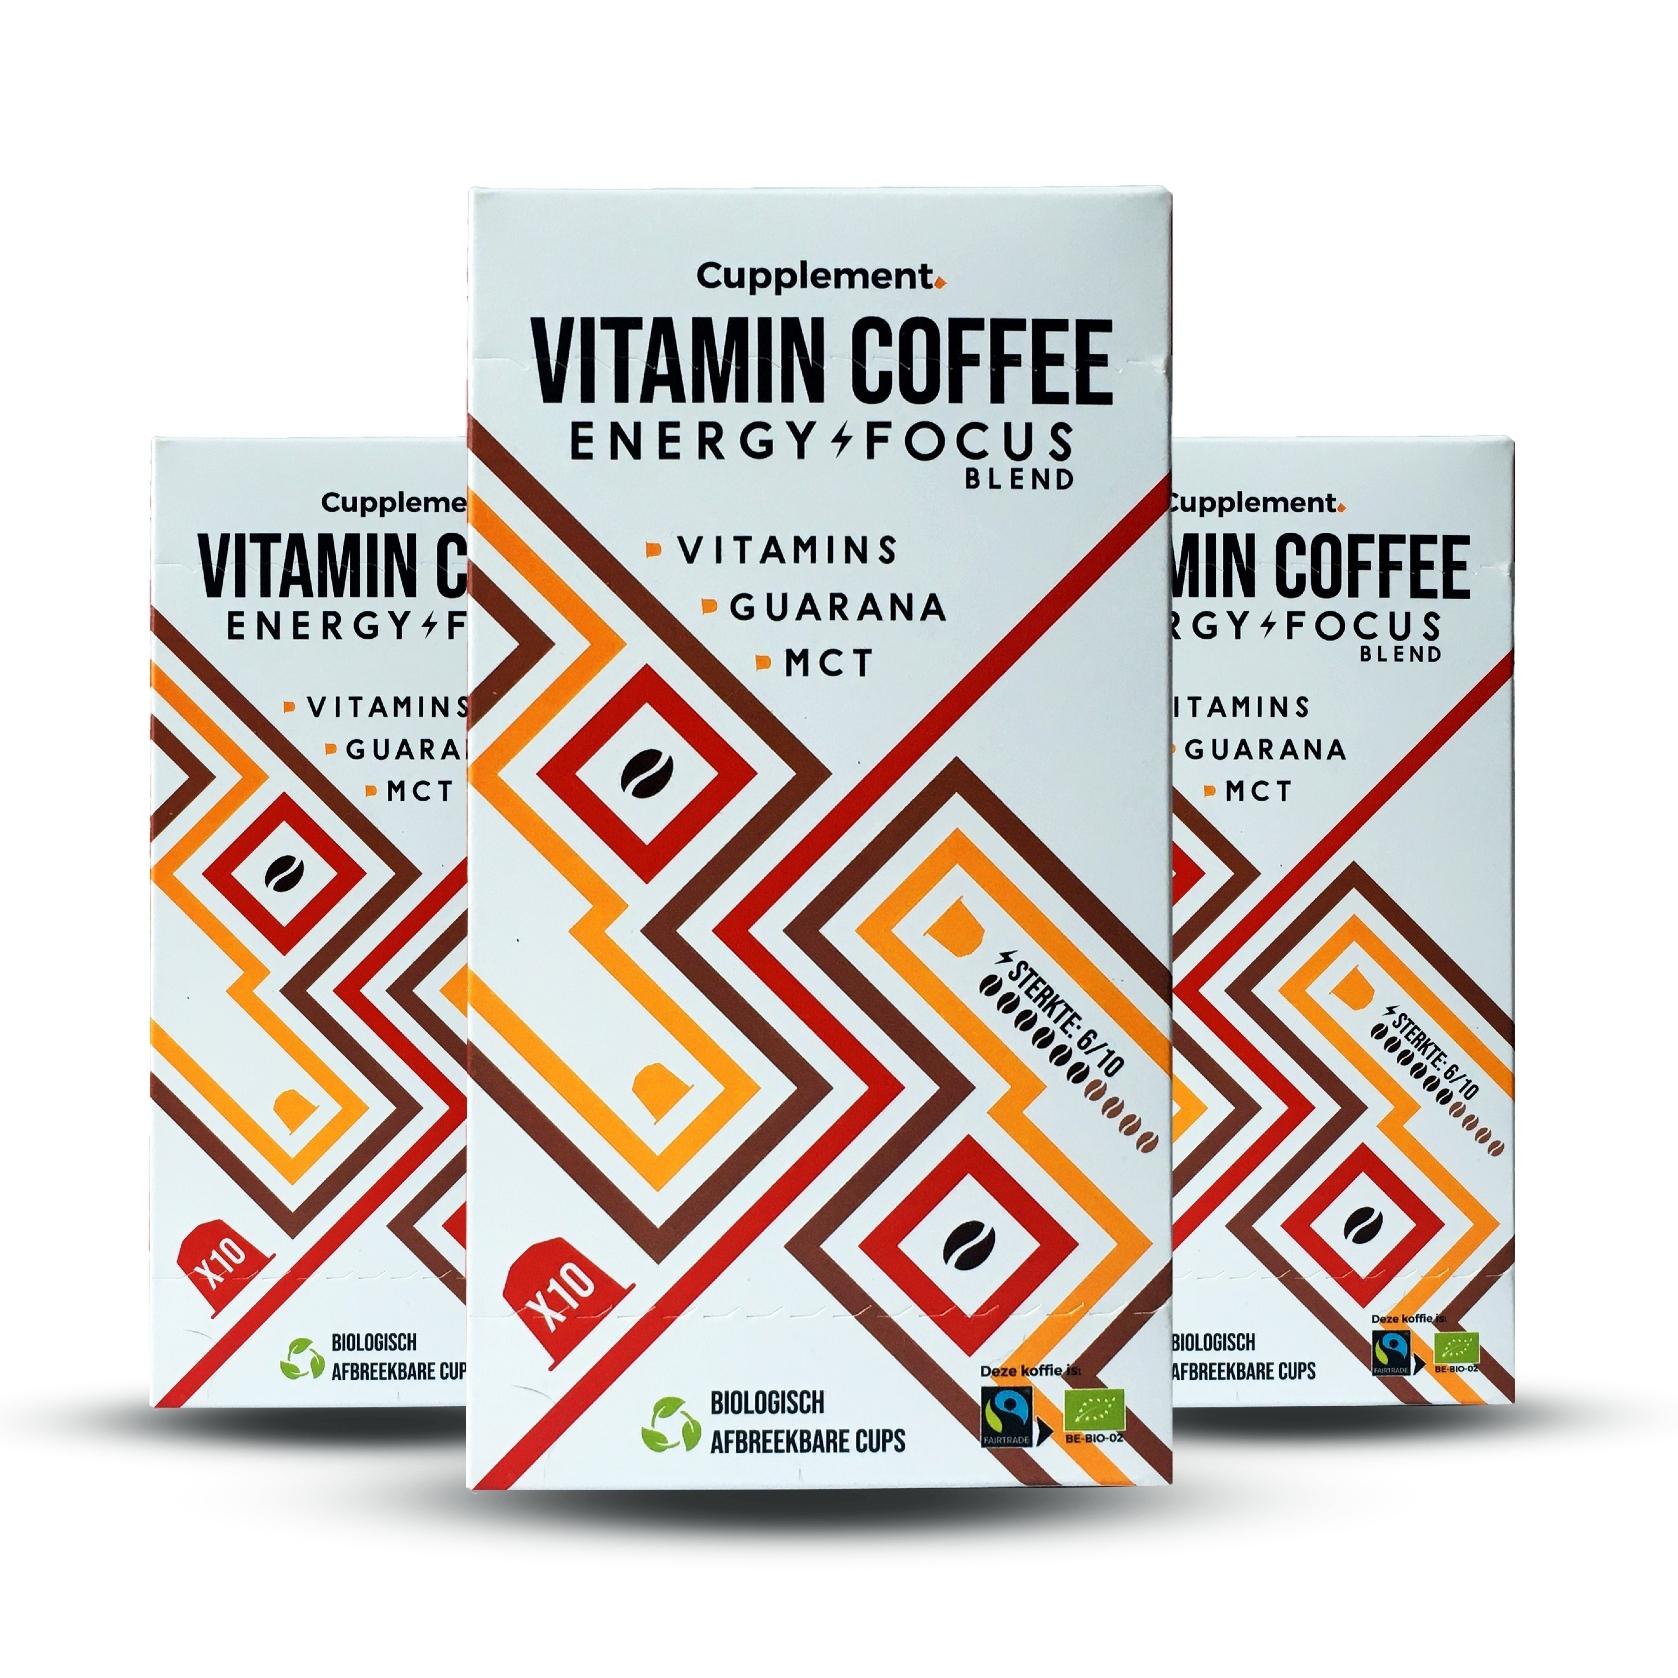 Cupplement product dragons den wateler fermin schoen koffie